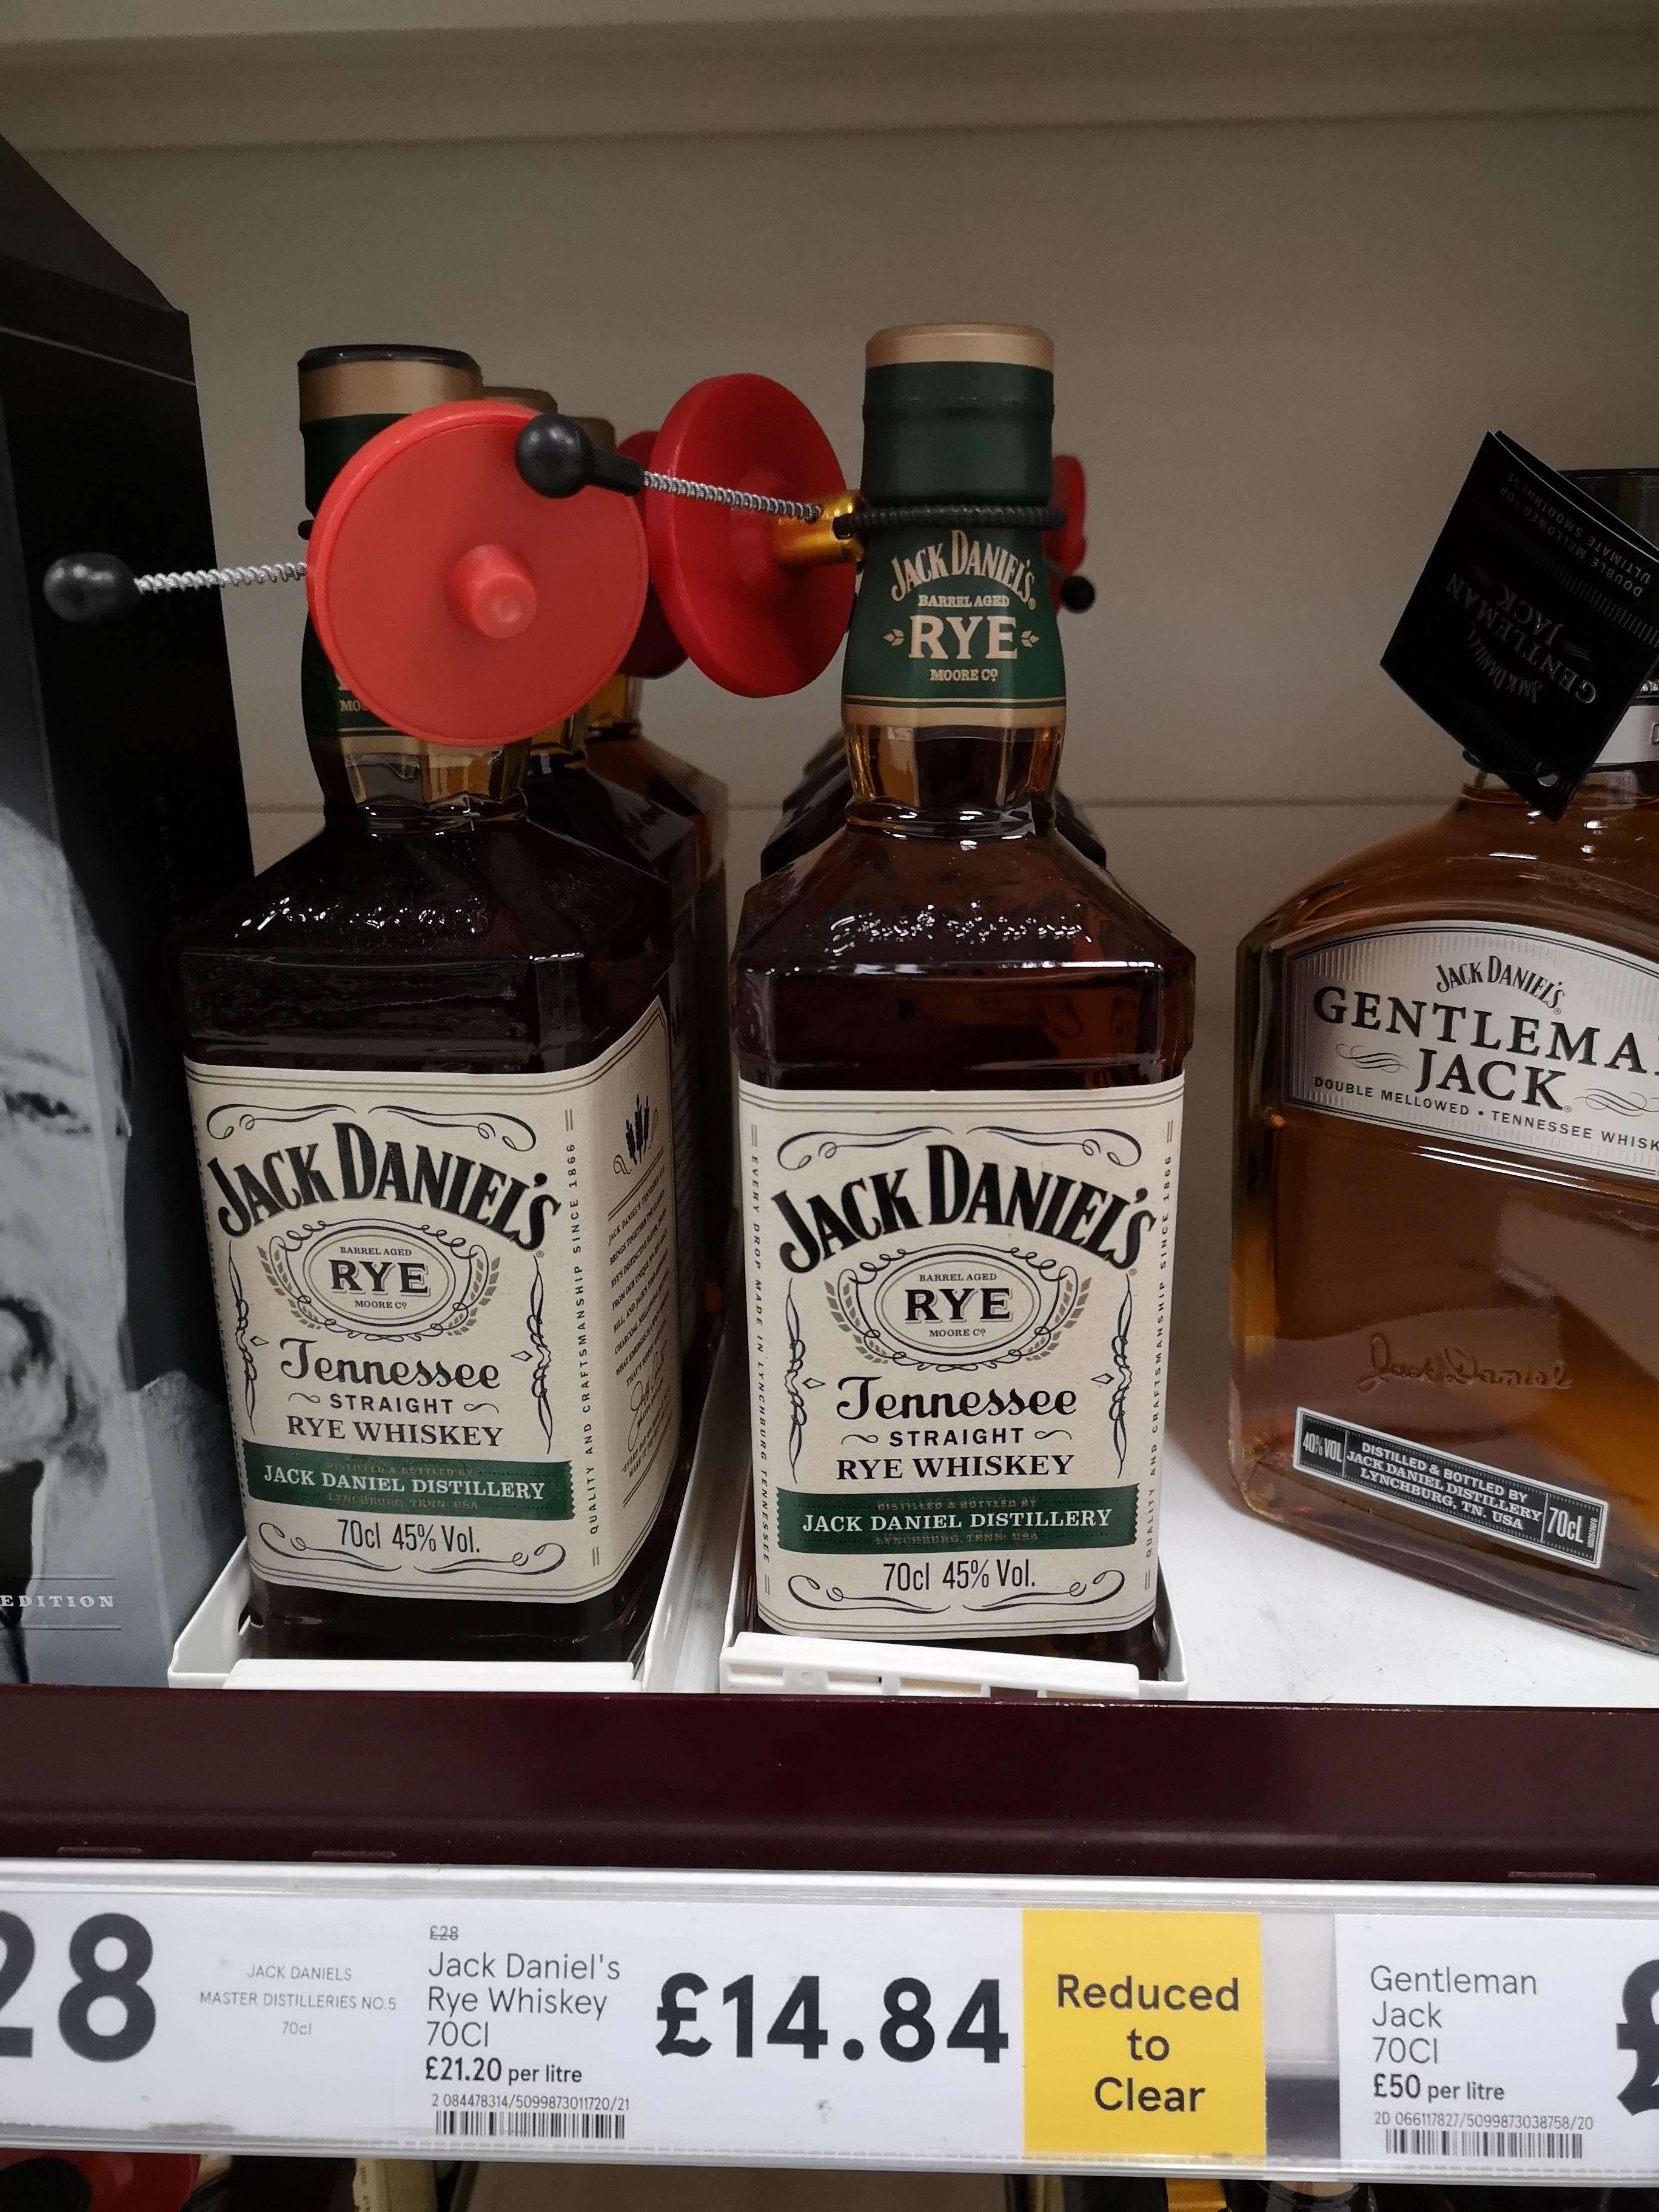 Jack Daniel's Tennessee Rye Straight Whisky, 70 CL. Instore @ Tesco, £14.84